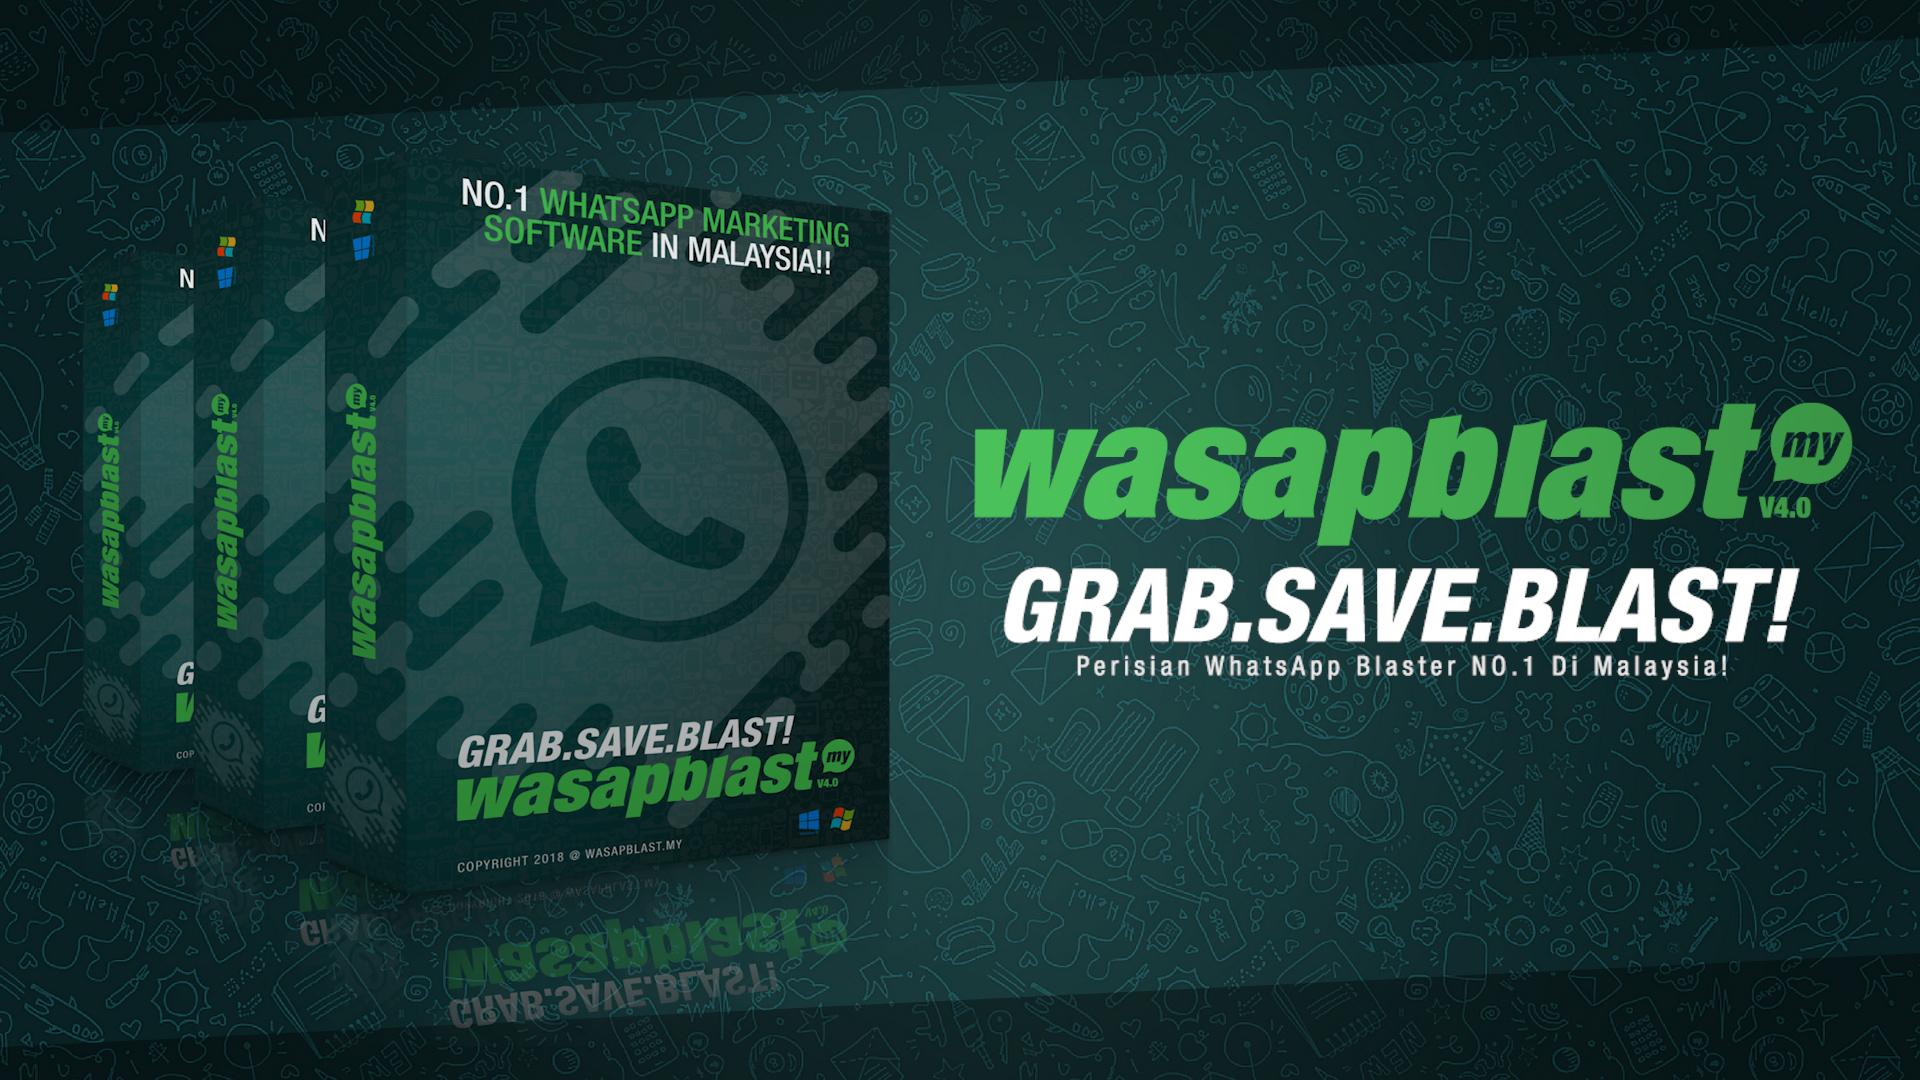 wasapblast | Sistem WhatsApp Blaster No 1 Di Malaysia!